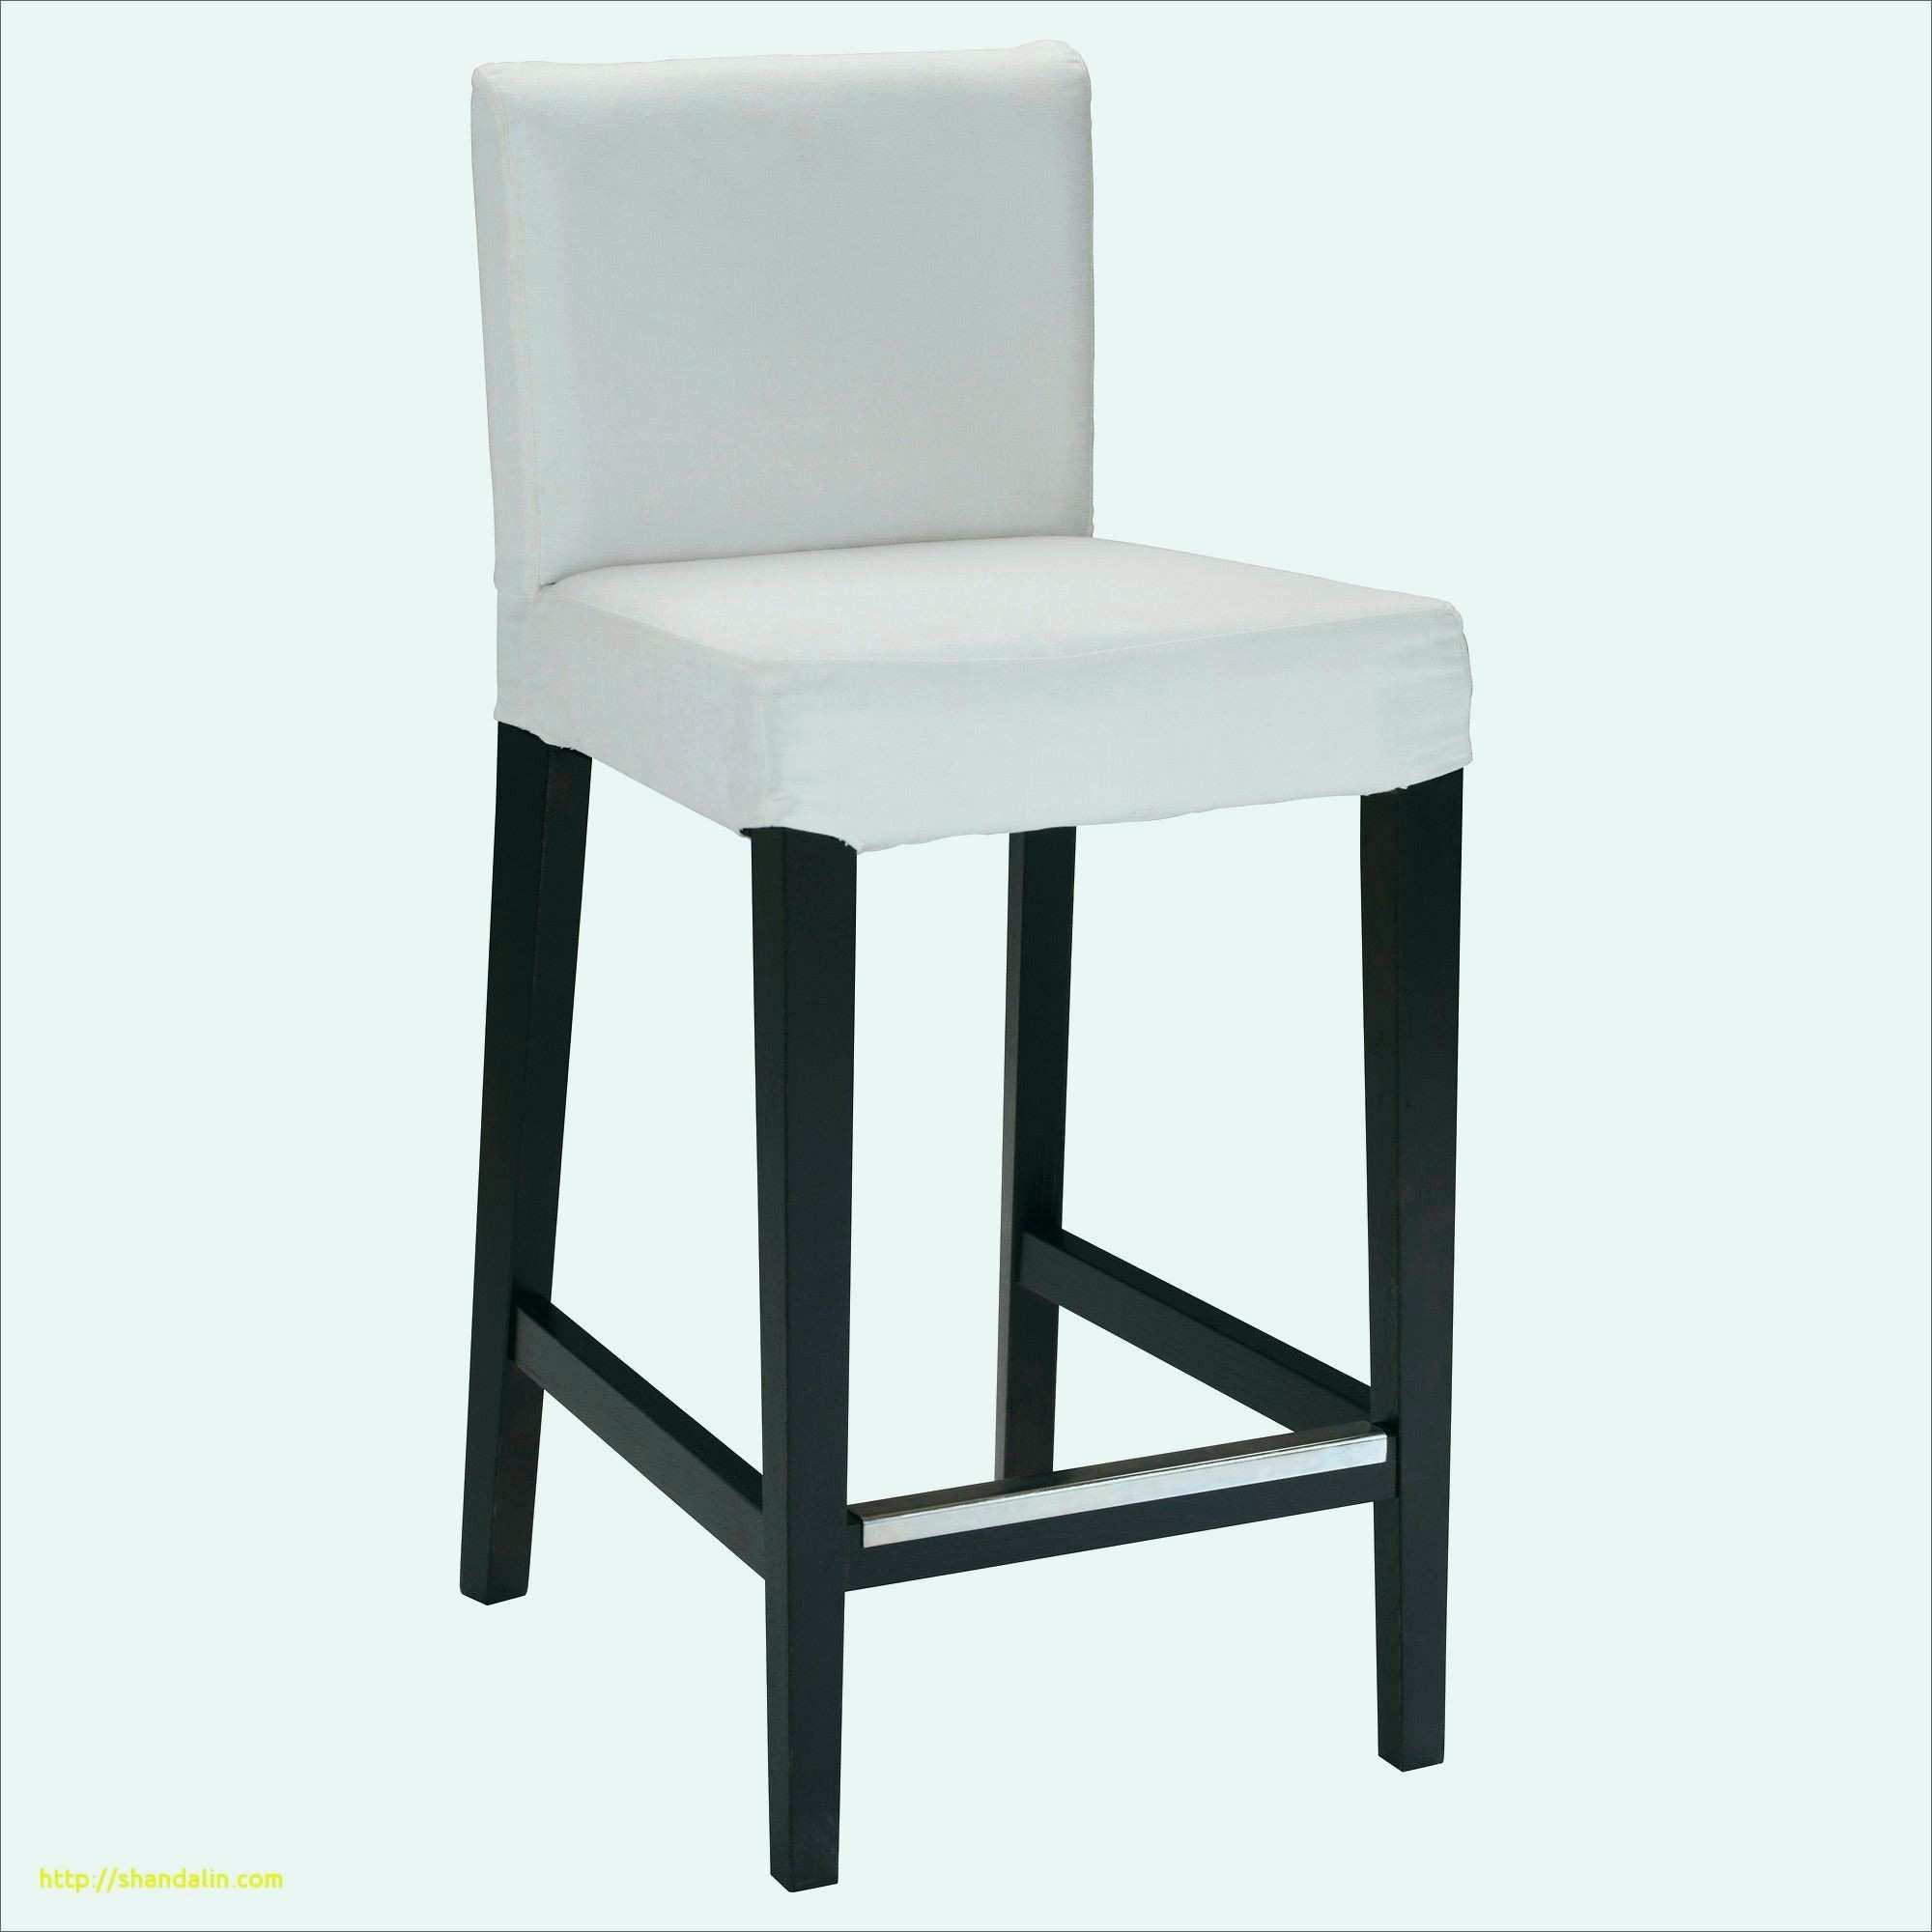 chaise rotin metal impressionnant chaise de bar rotin tabouret en rotin impressionnant banc osier 0d of chaise rotin metal 1